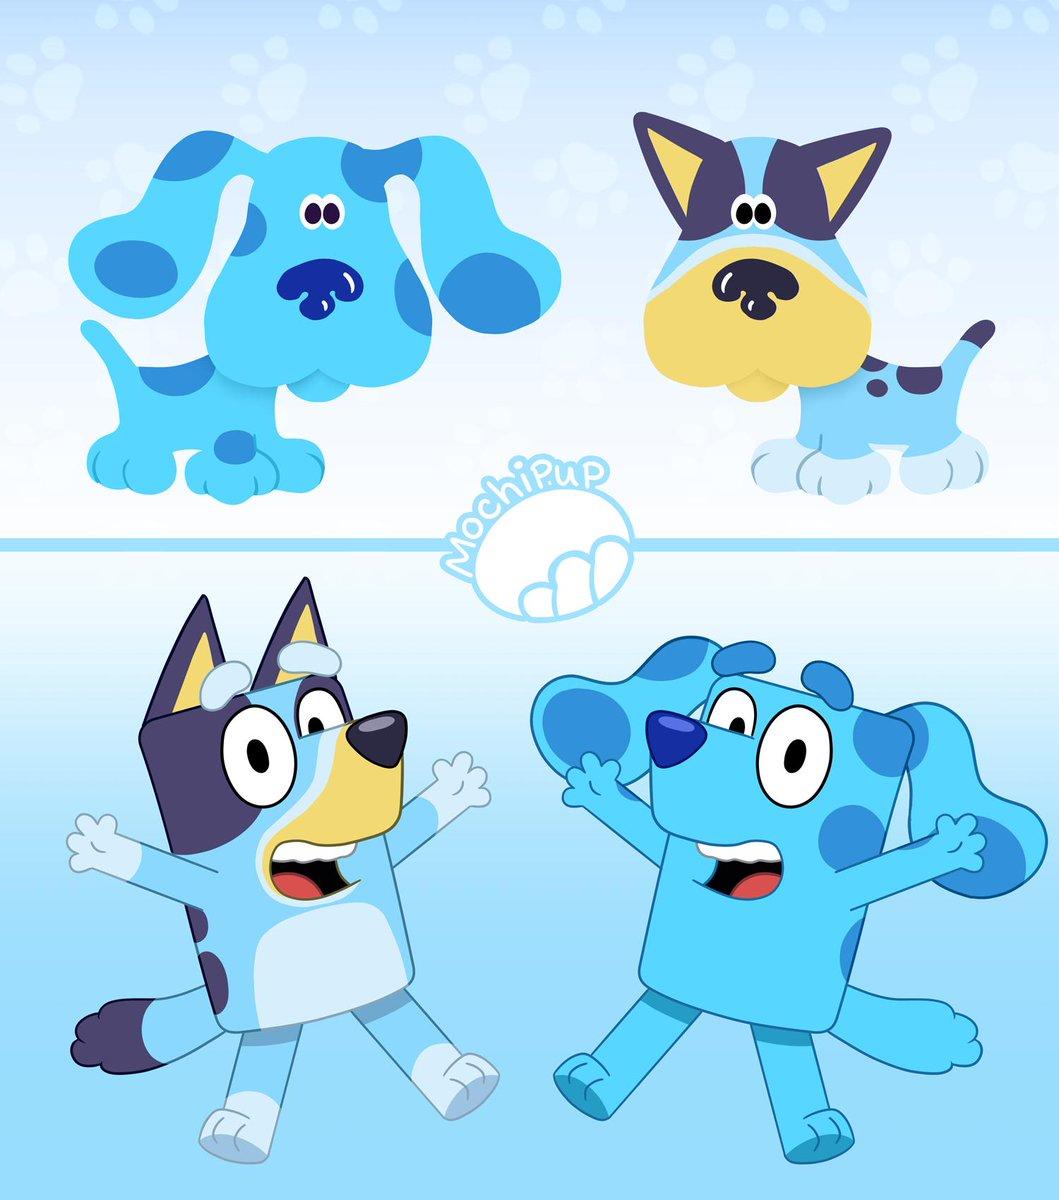 It's Bluey's Clues! #Bluey #BluesClues I just had to. <br>http://pic.twitter.com/rN28XRbFIt